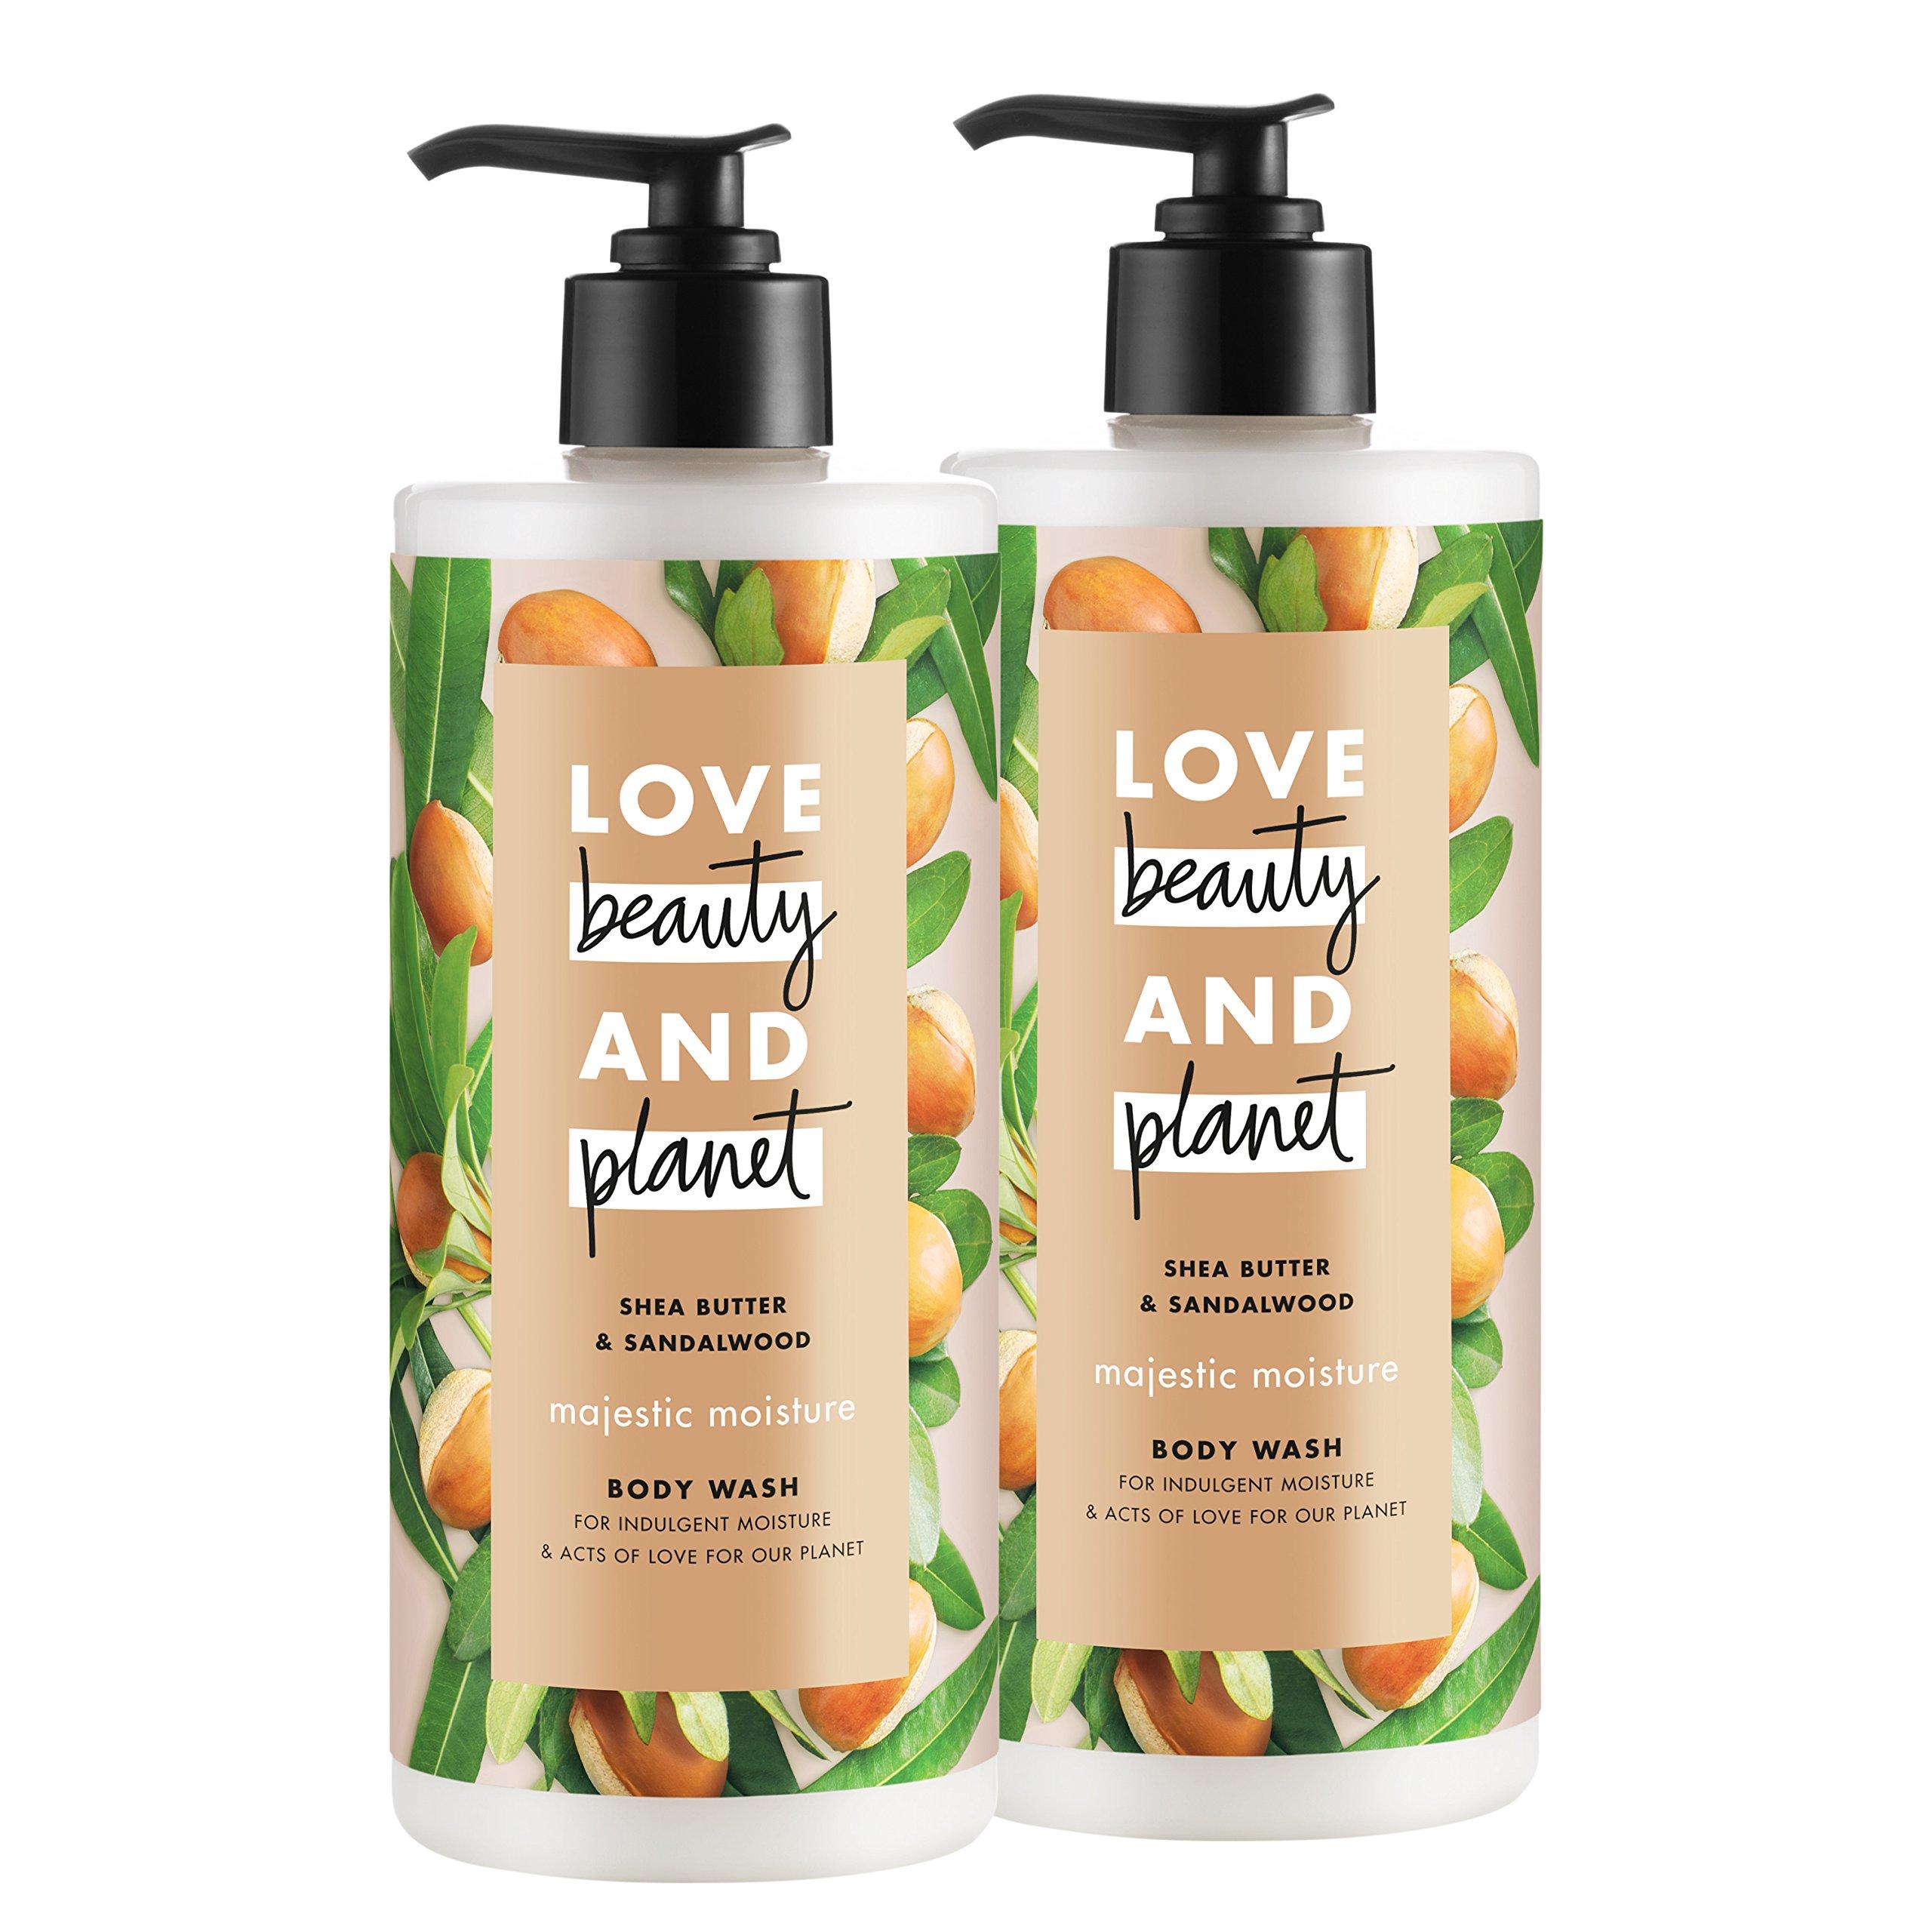 Love Beauty And Planet Majestic Moisture Body Wash, Shea Butter & Sandalwood, 16 oz, 2 ct